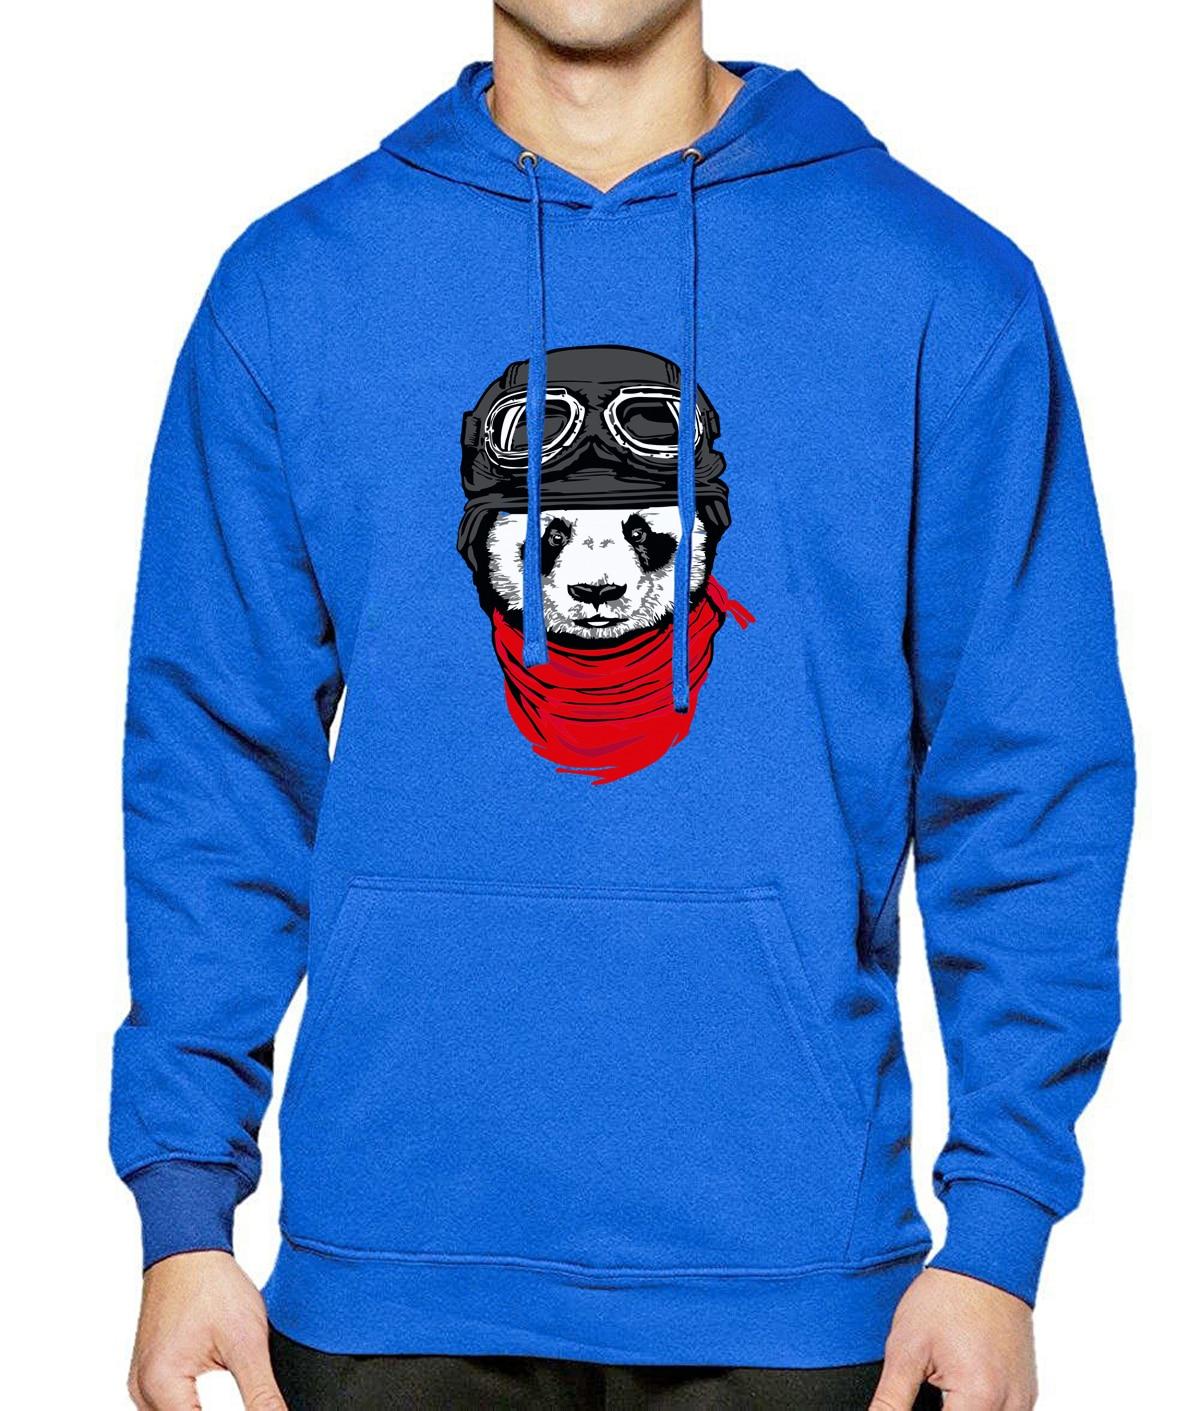 Spring Winter Fleece Warm Hoody With Hat 2017 Hot Long Sleeve Hoodies Mens Panda Crazy Print Cool Hip Hop Streetwear Tracksuit